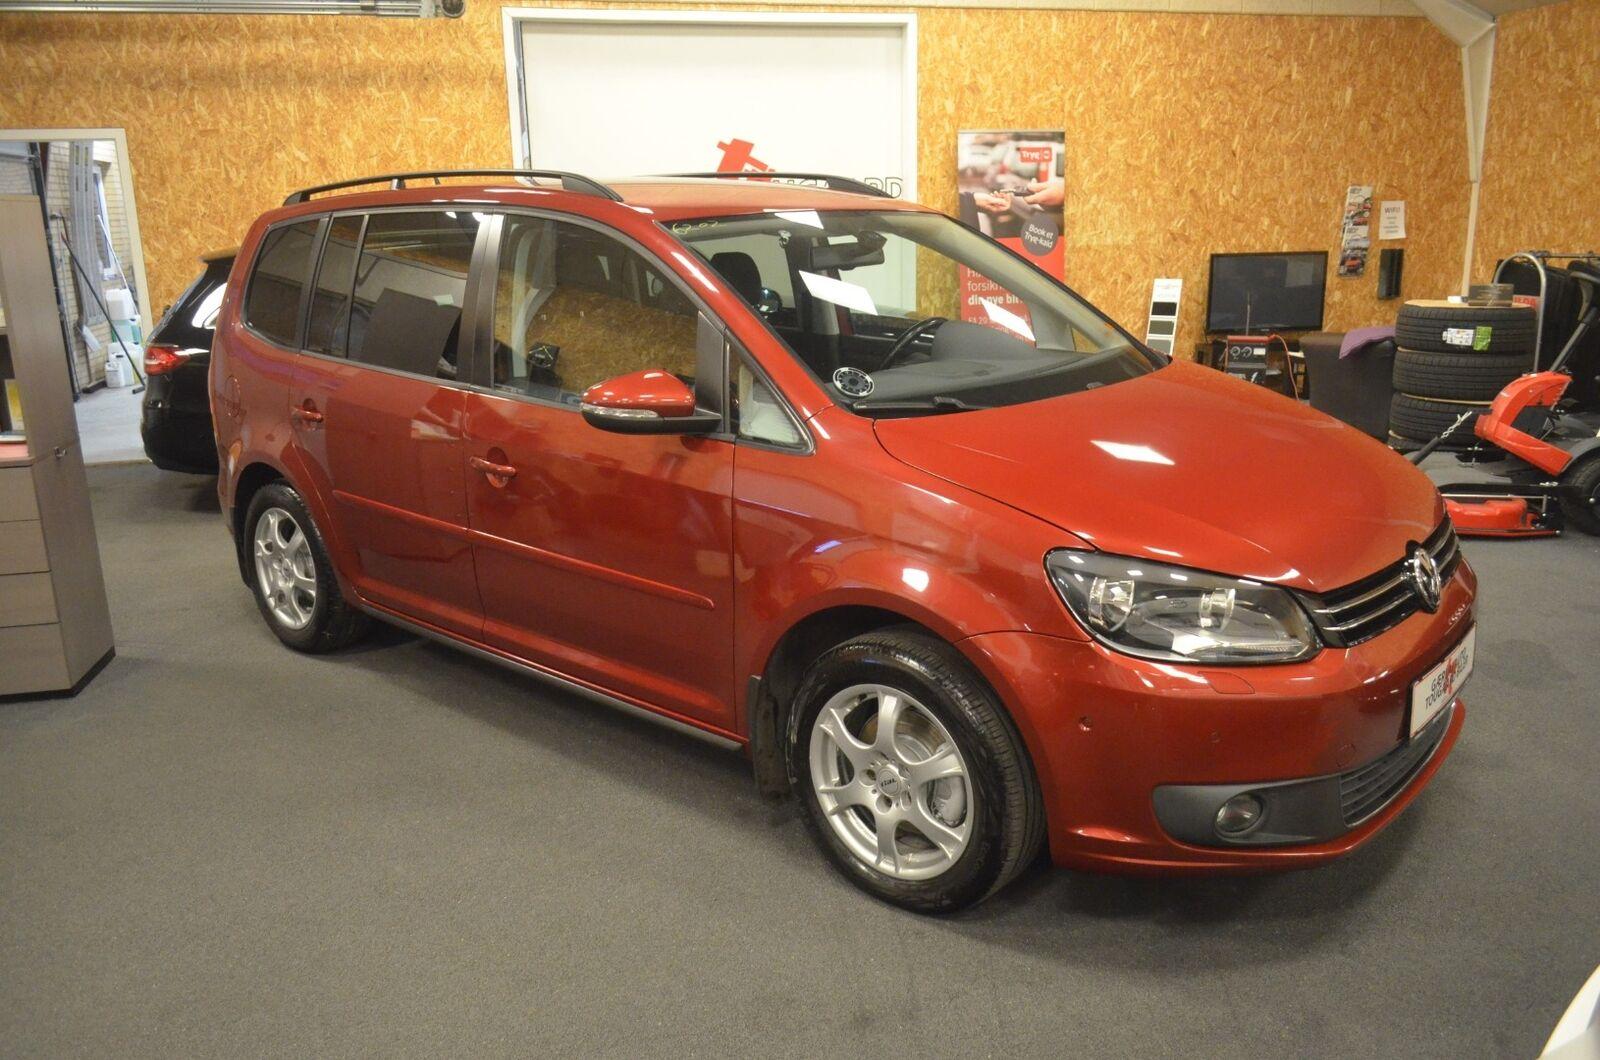 VW Touran 1,6 TDi 105 Comfortline BMT 7prs 5d - 109.800 kr.